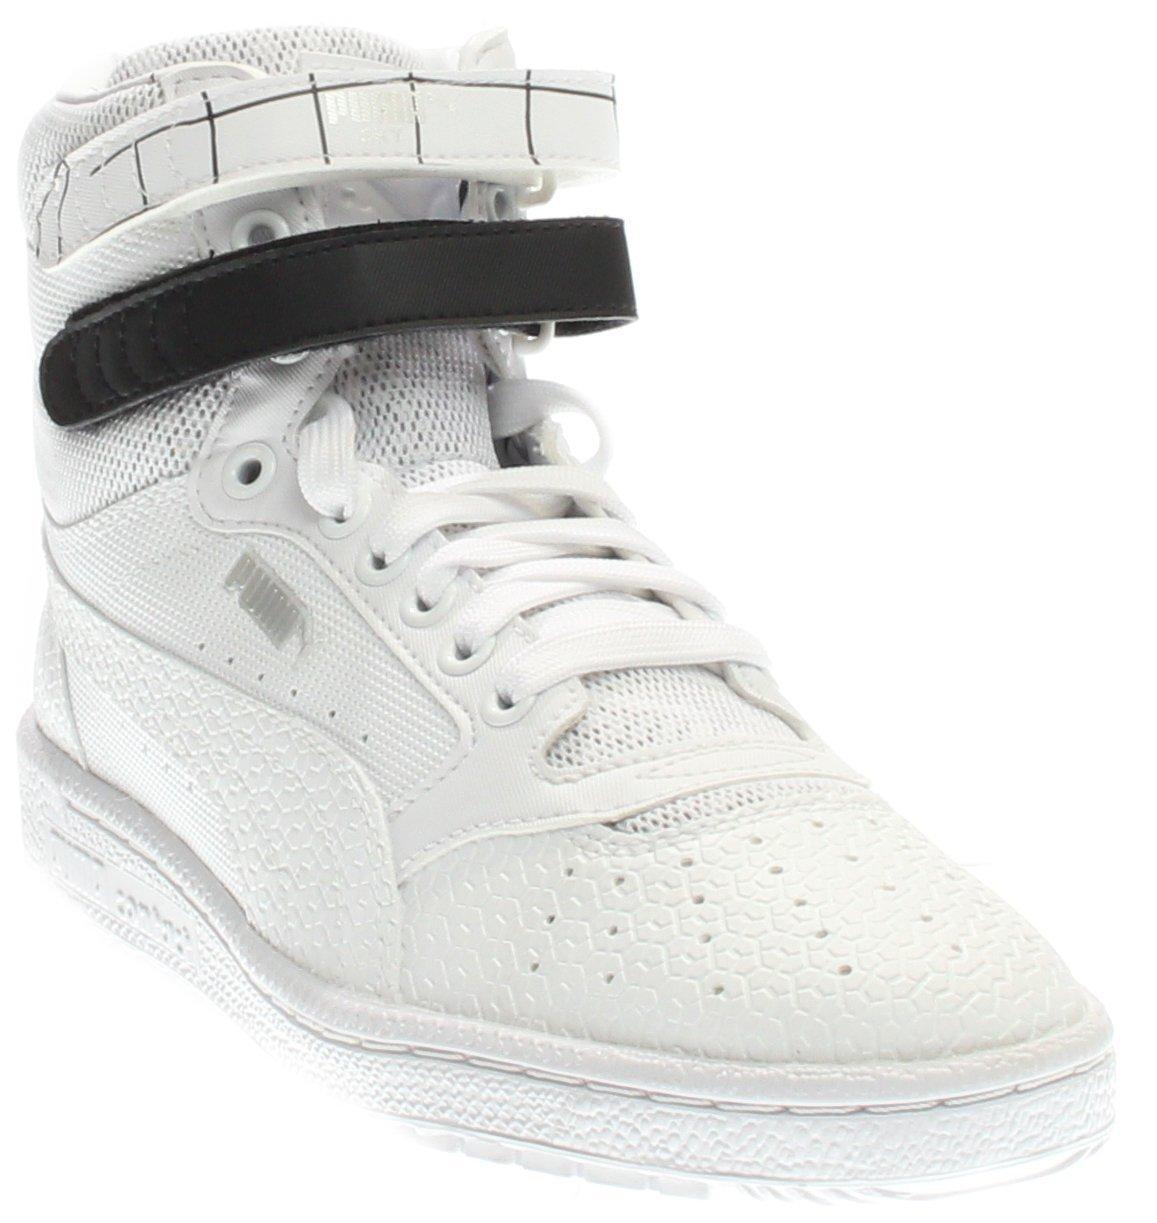 PUMA Women's Sky Ii Hi Sf Texture WN's Basketball Shoe, White Black, 9 M US